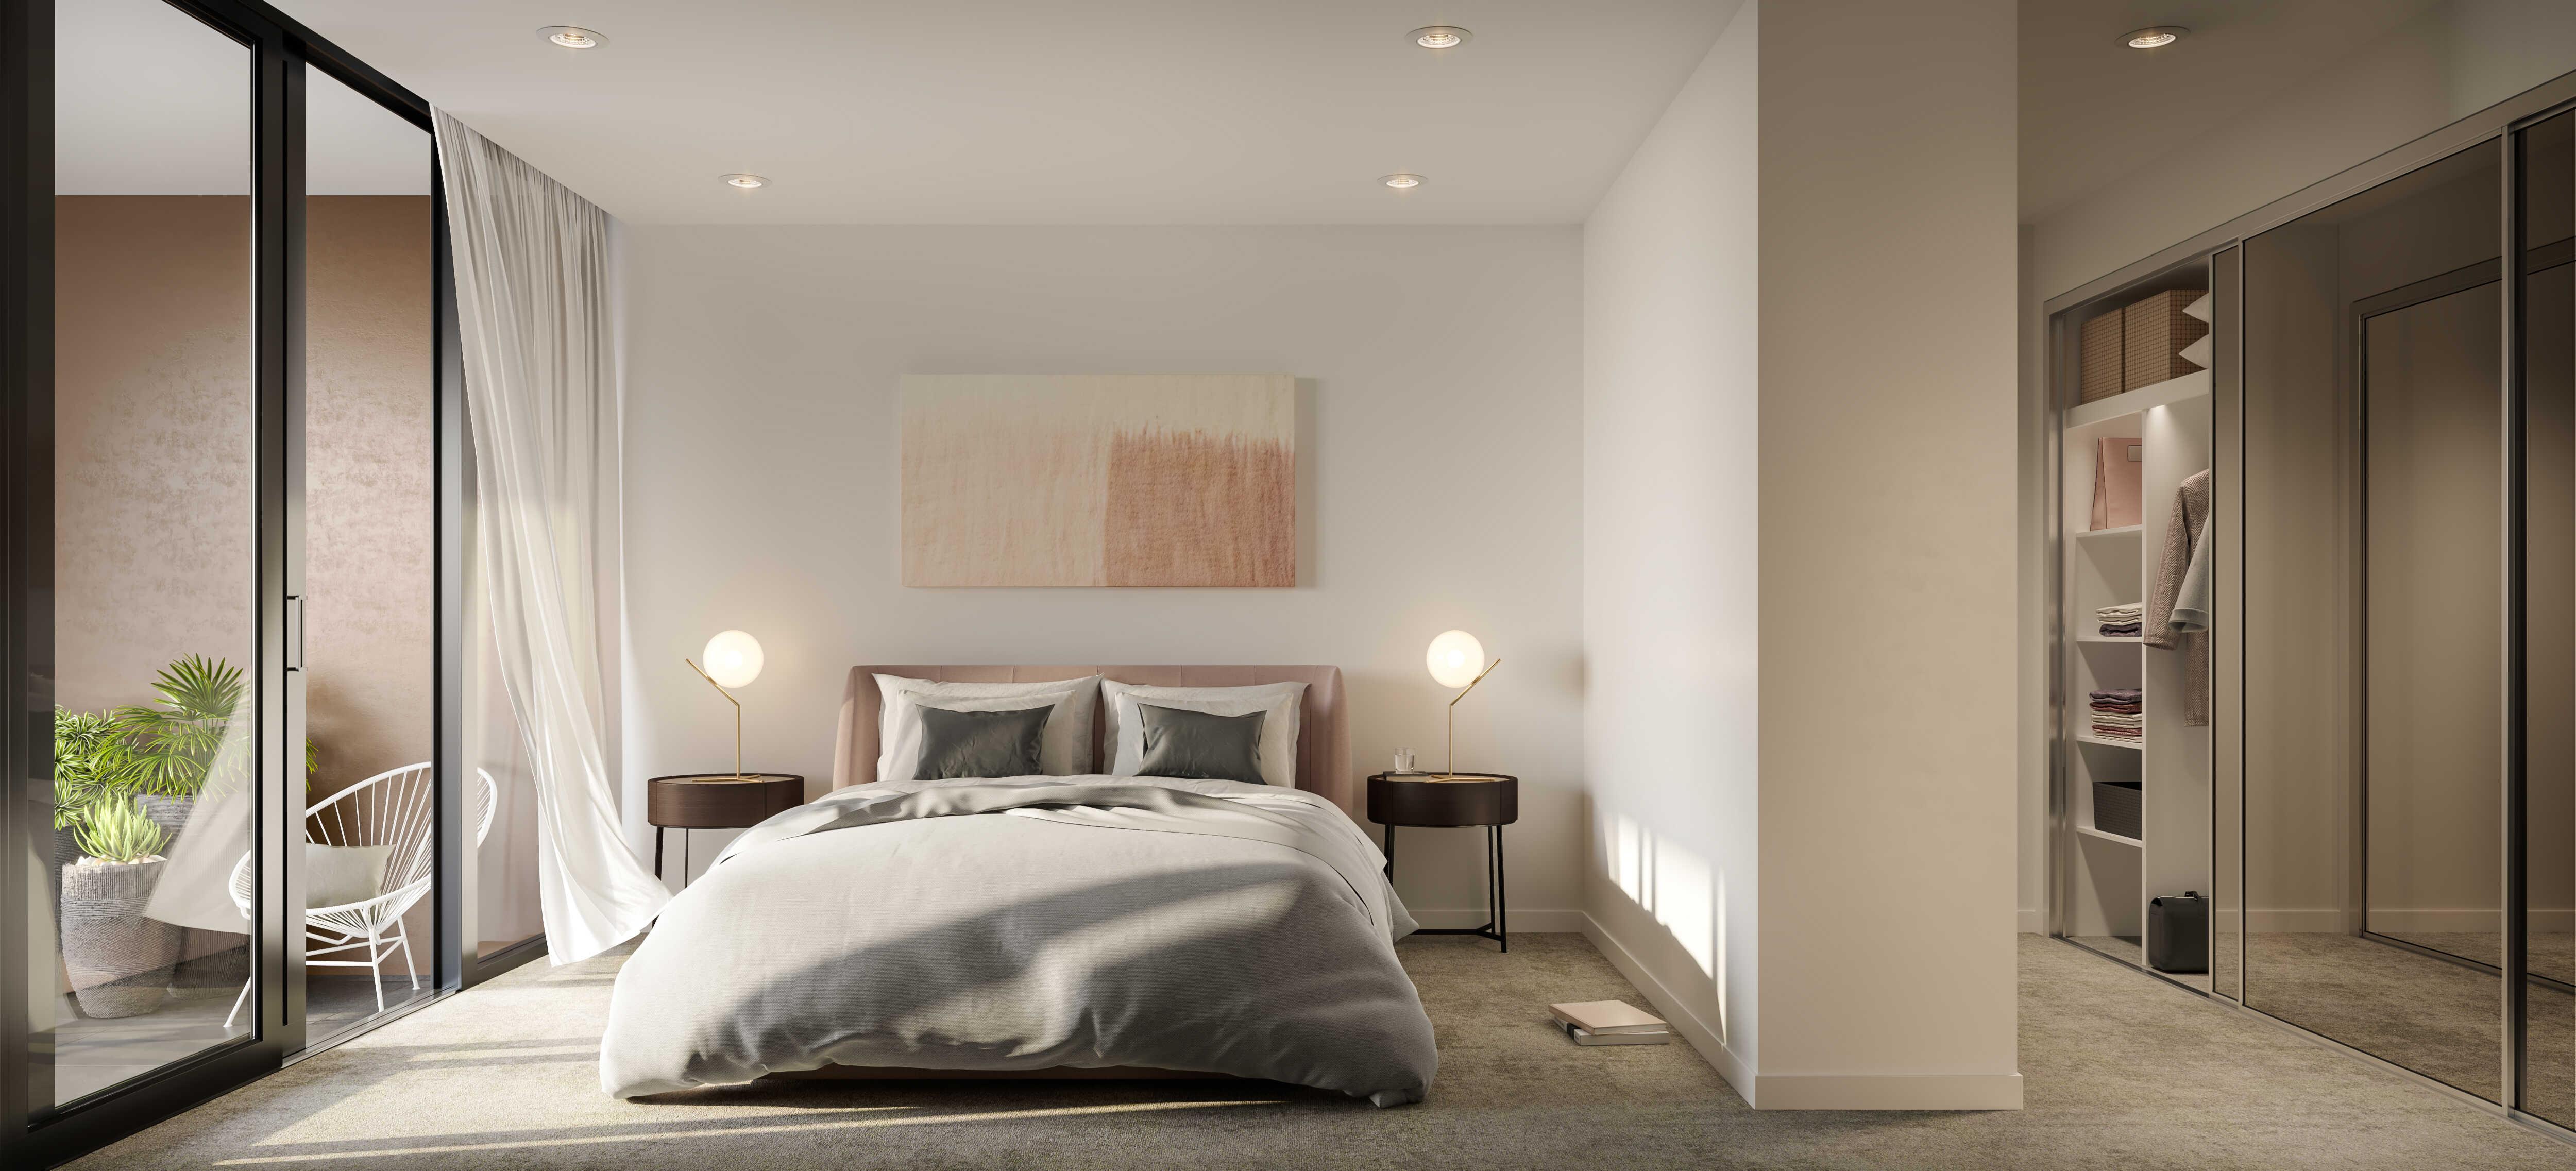 Residential Interior Render - Bedroom